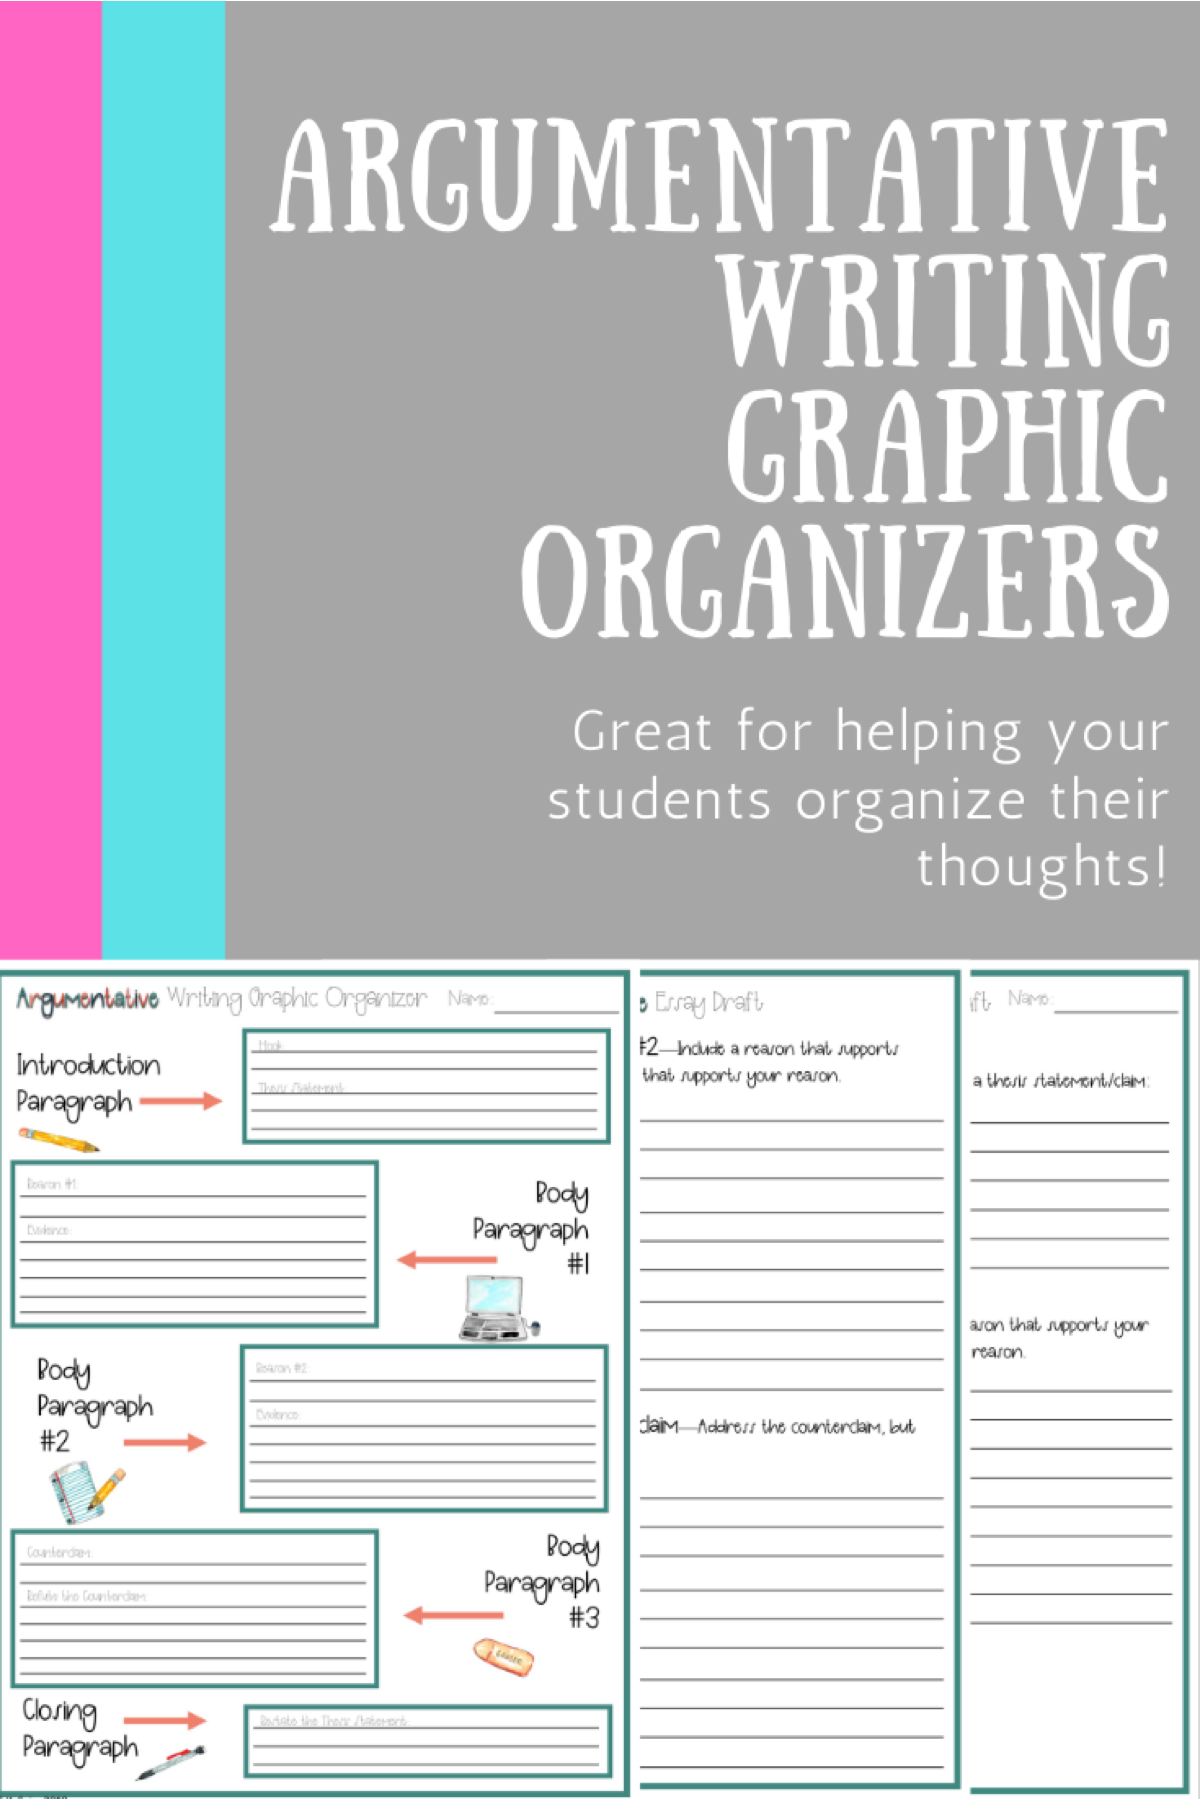 Argumentative Essay Writing Graphic Organizers 6th 12th